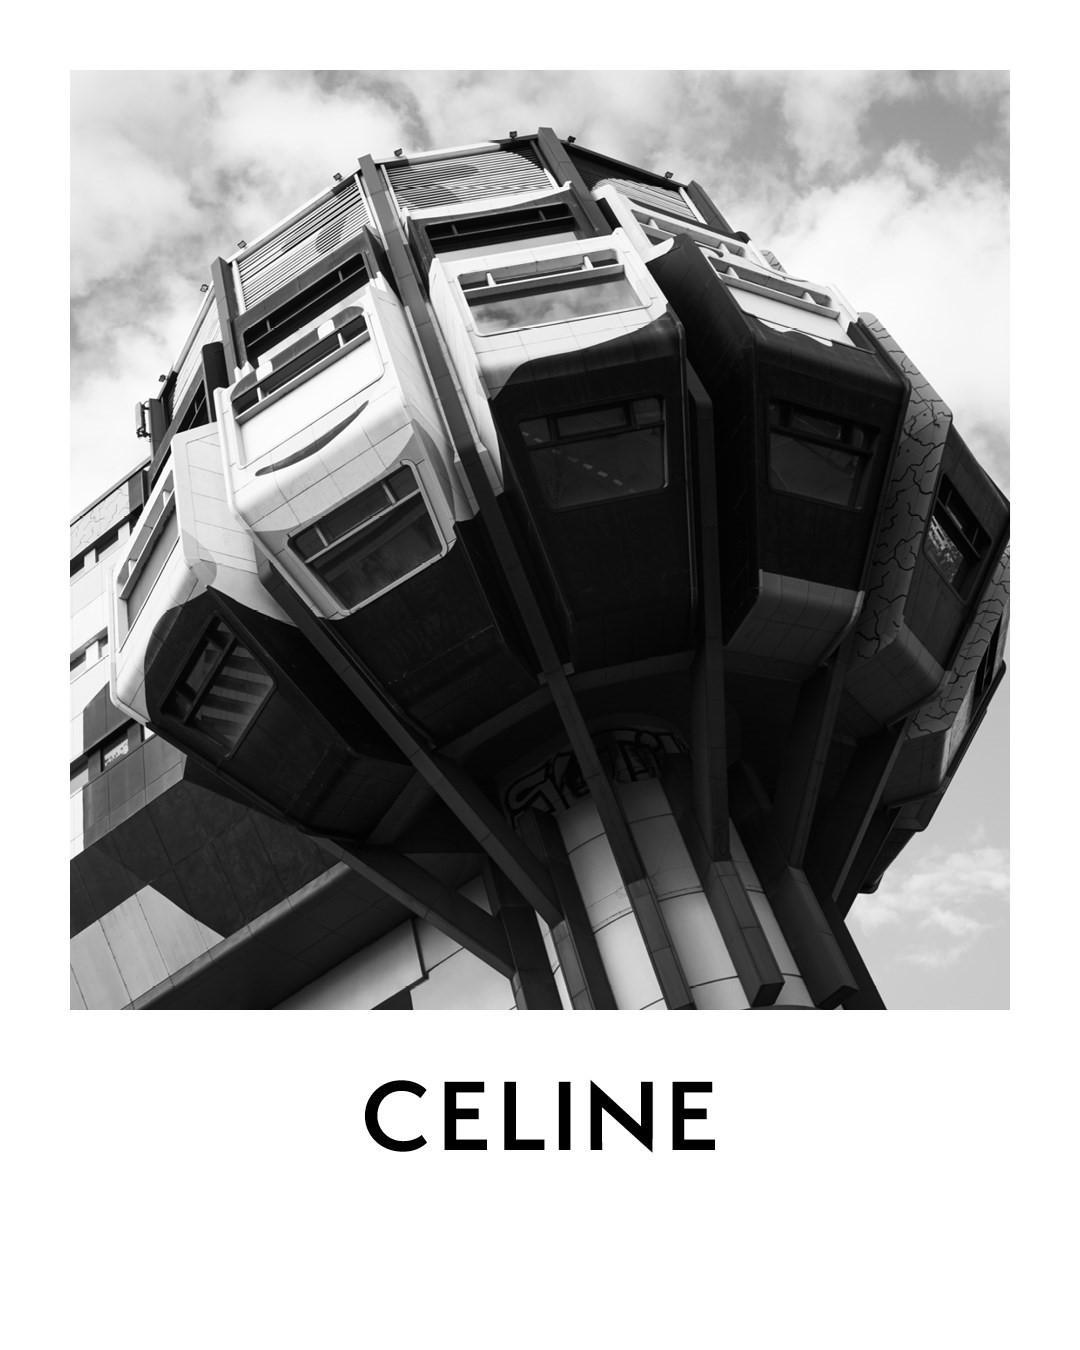 celine_mens_fall_2019_campaign3.jpg